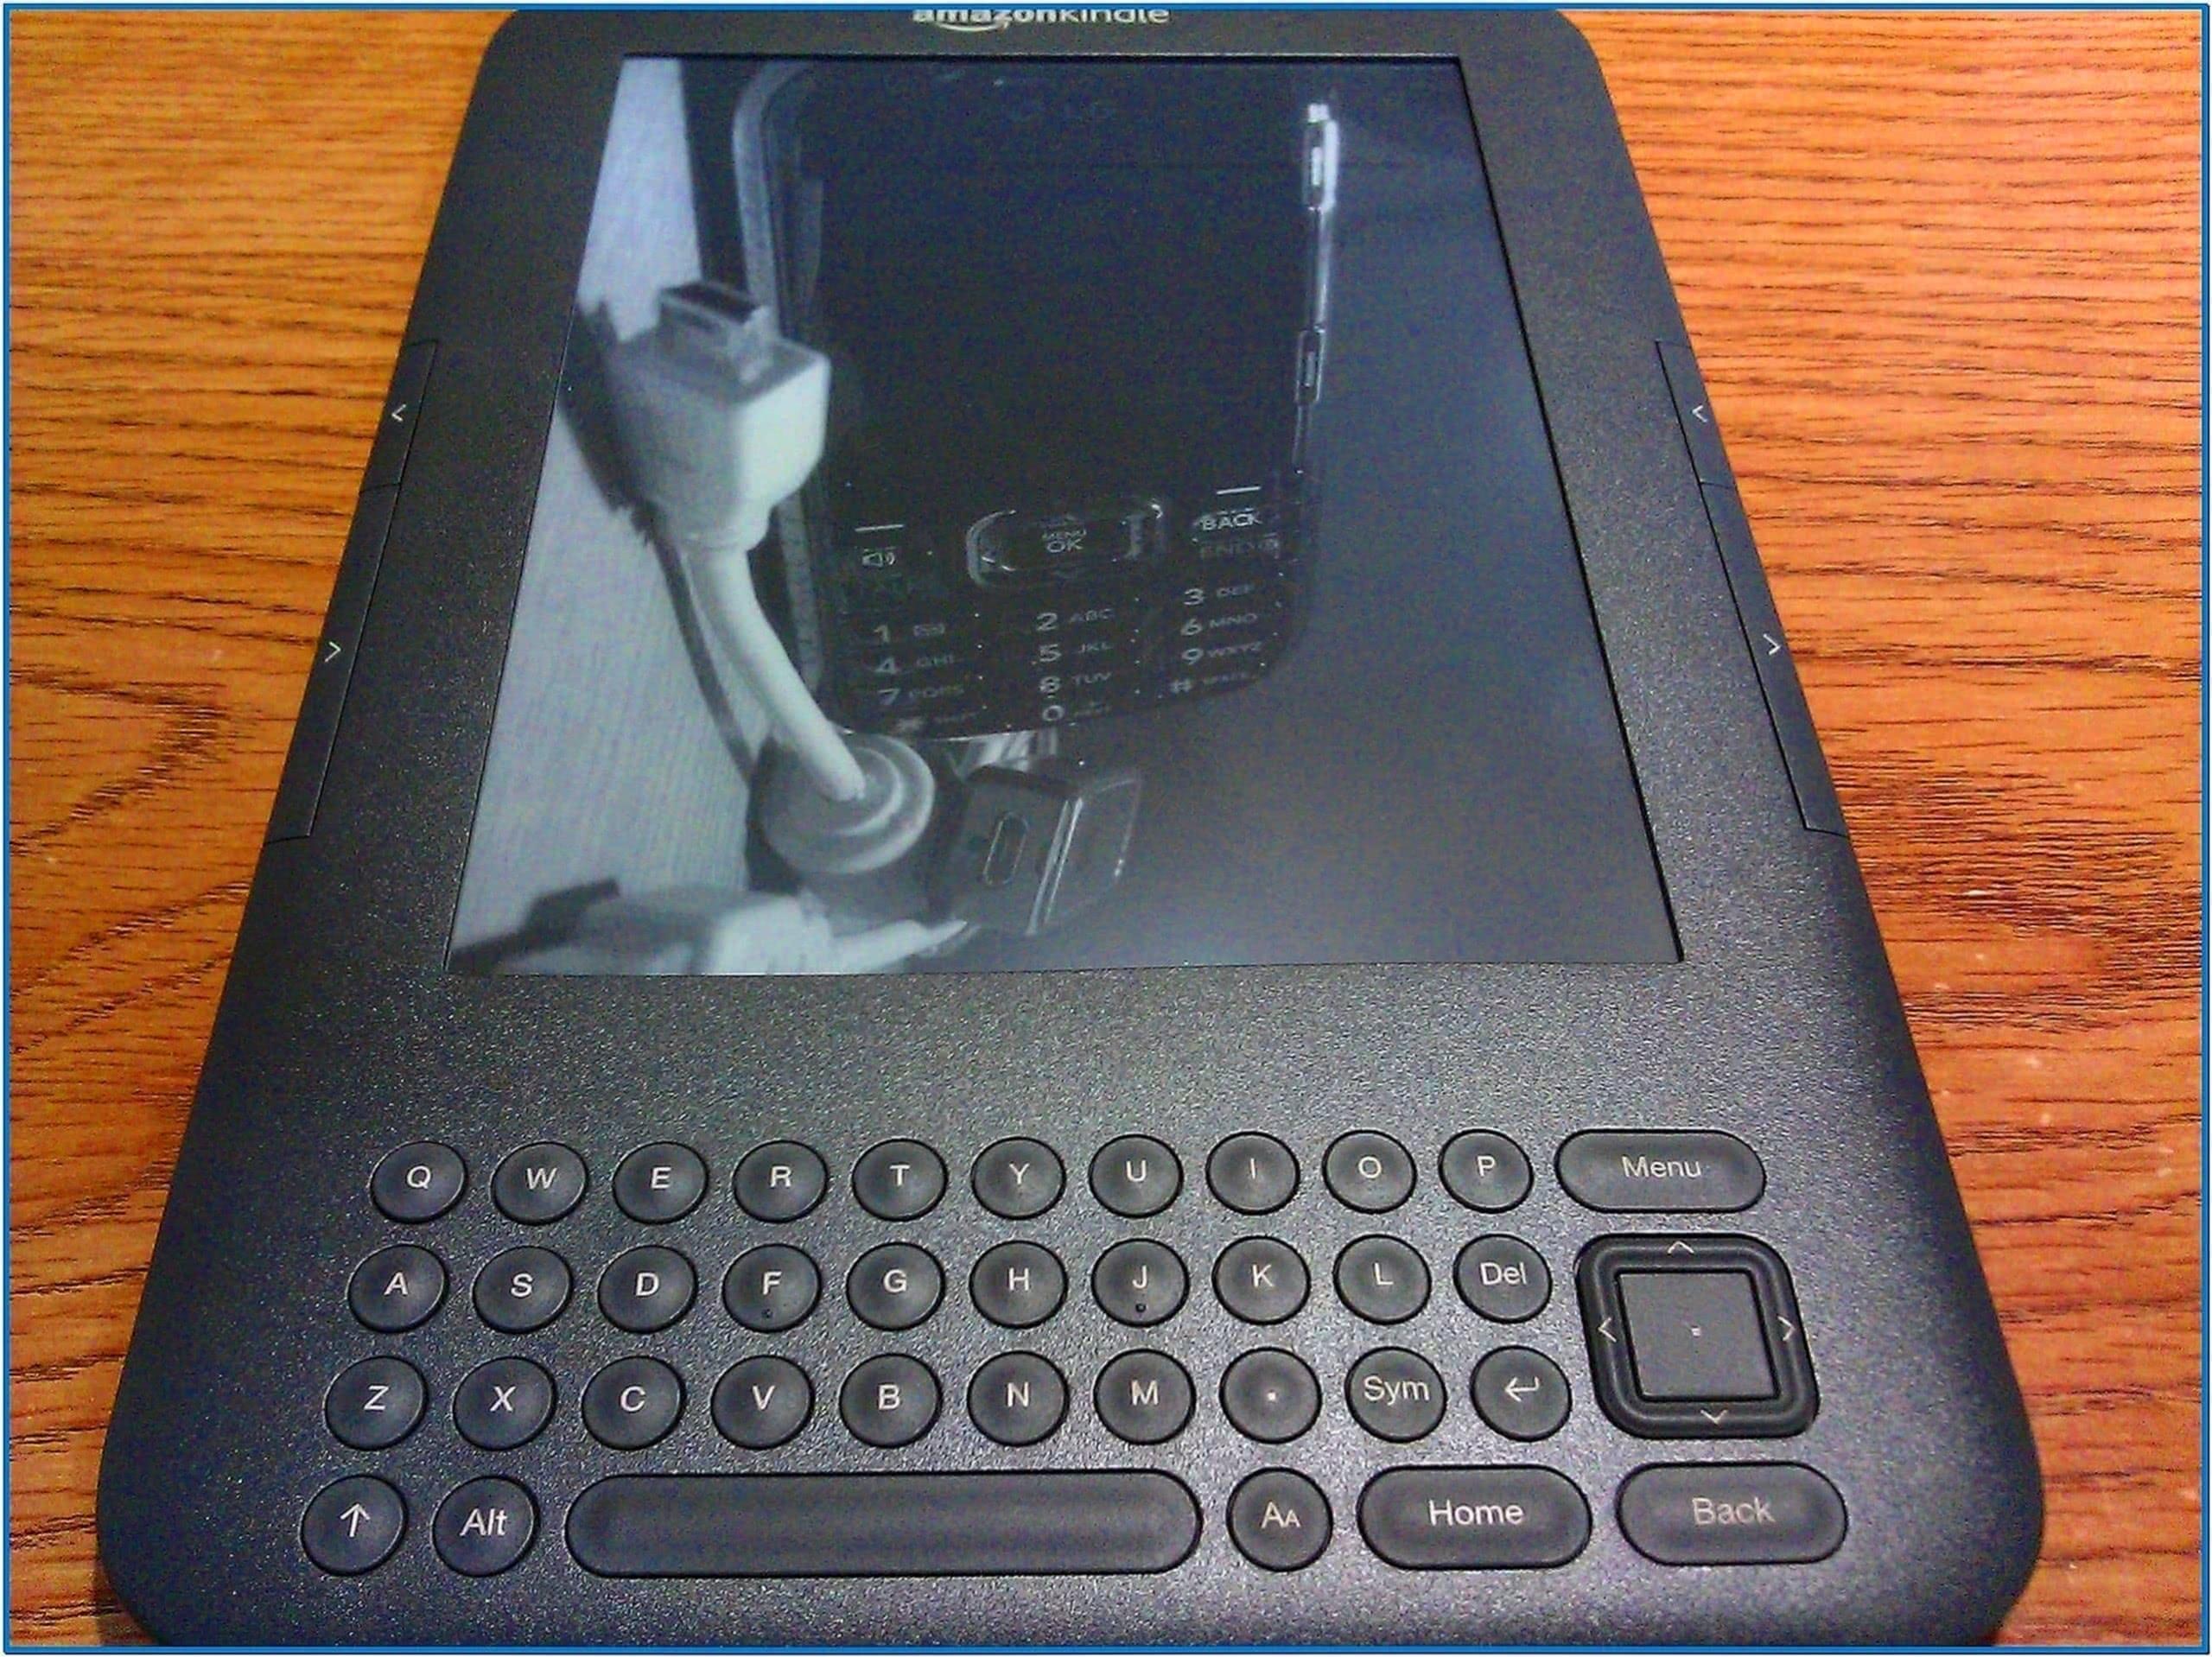 Amazon Kindle 3 Screensaver Hack